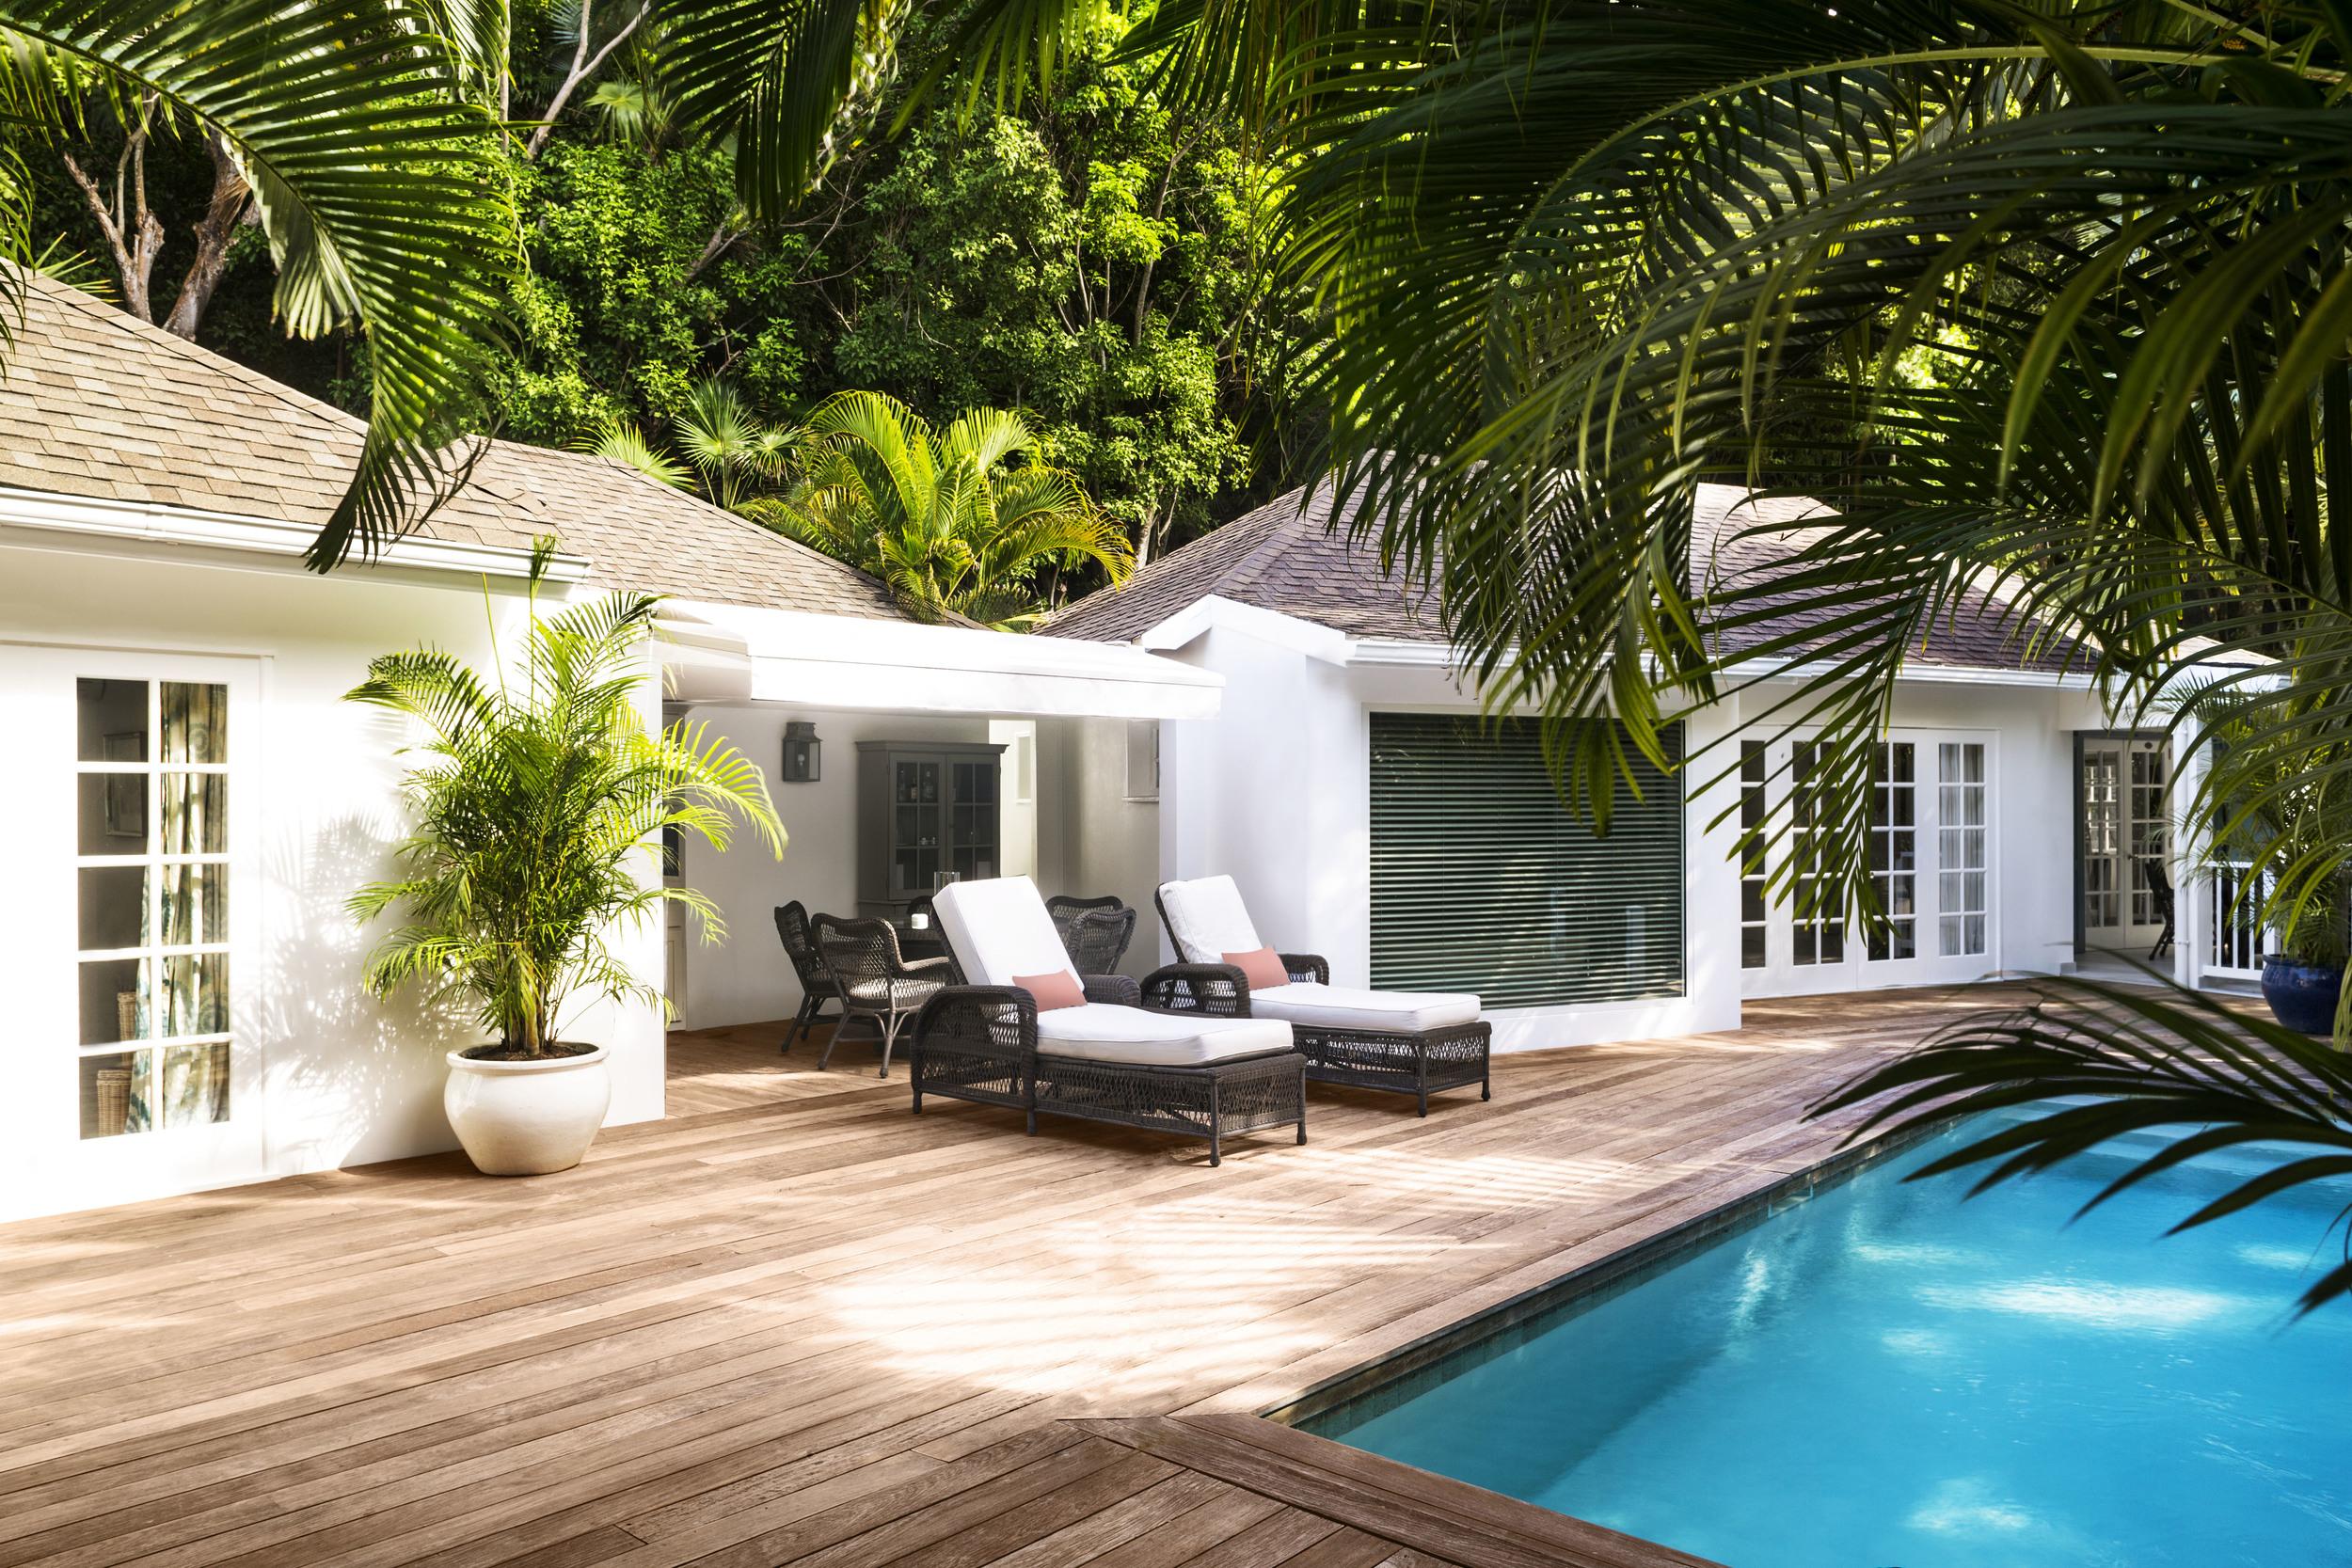 20150825123407_02-08-2-bed-garden-suite-pool-s-candito[1].jpg